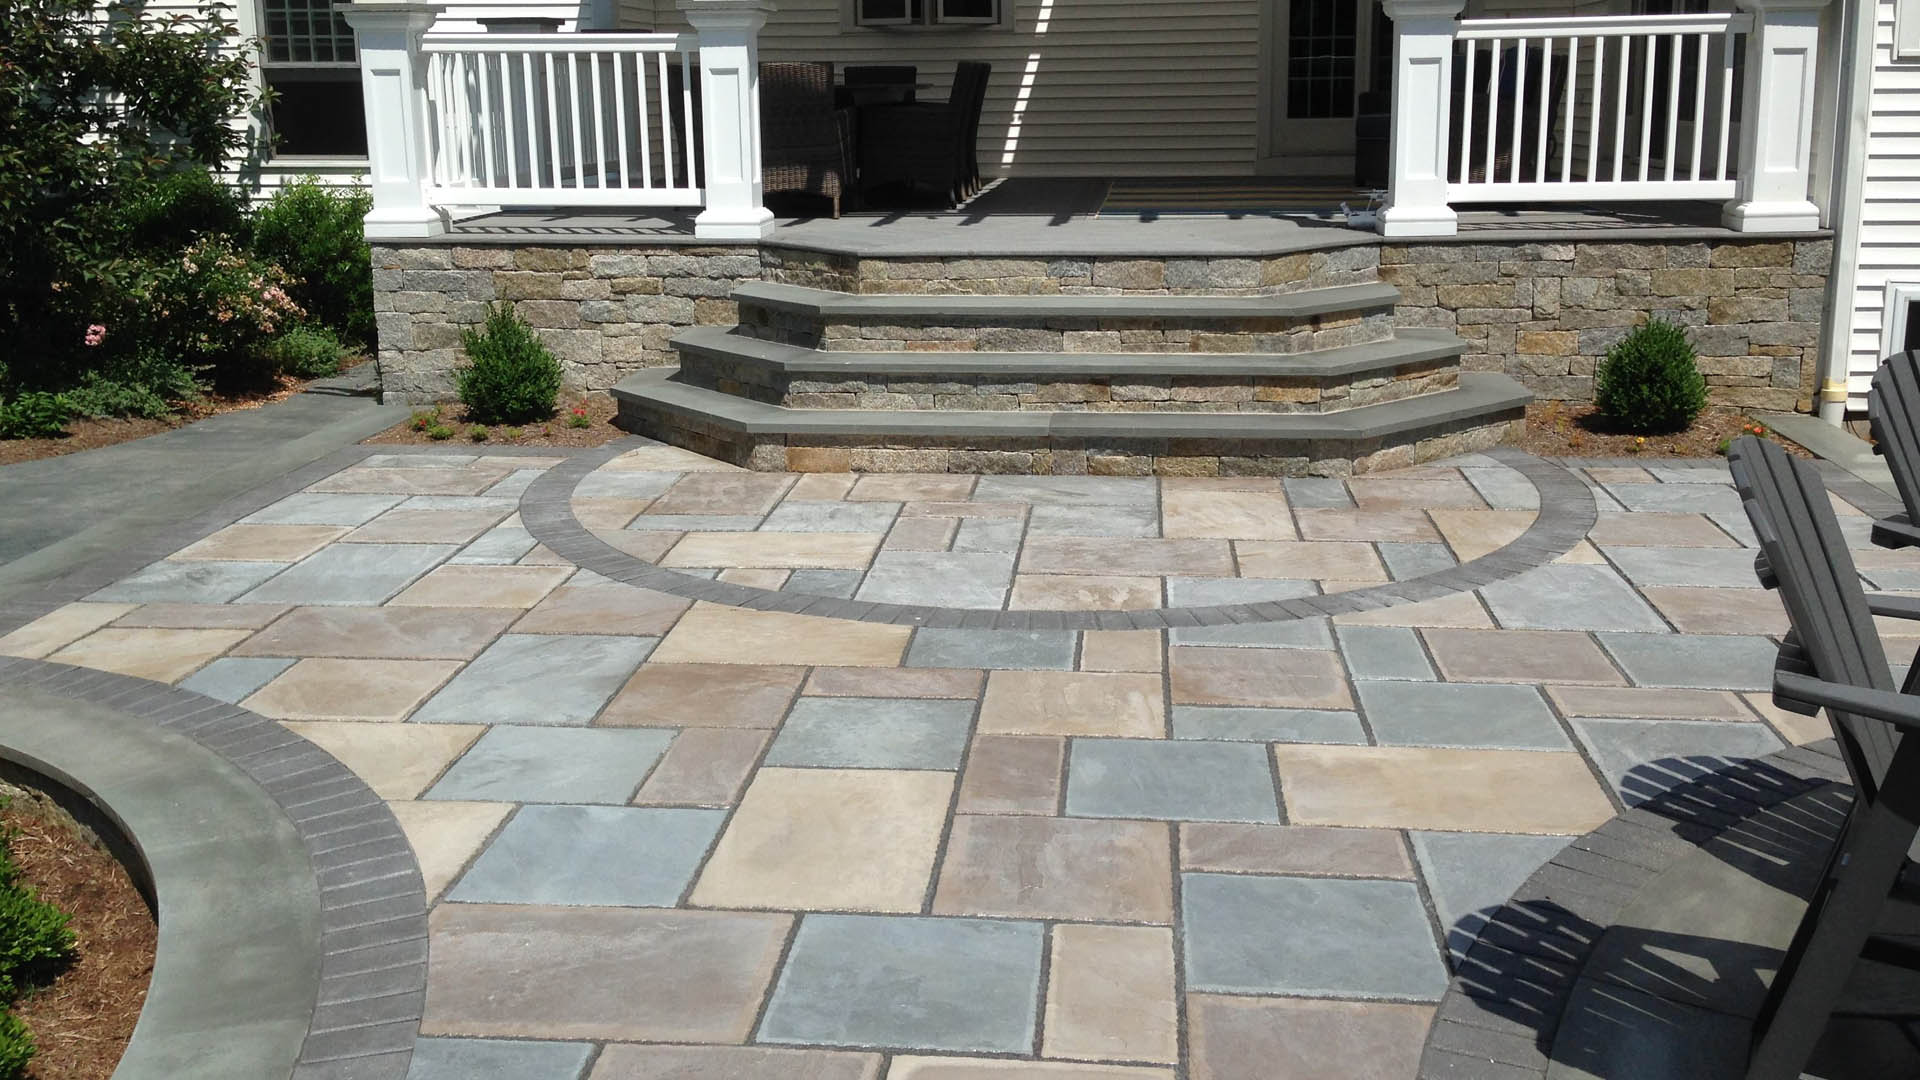 Portland Masonry Contractor for masonry repair, brick & custom masonry